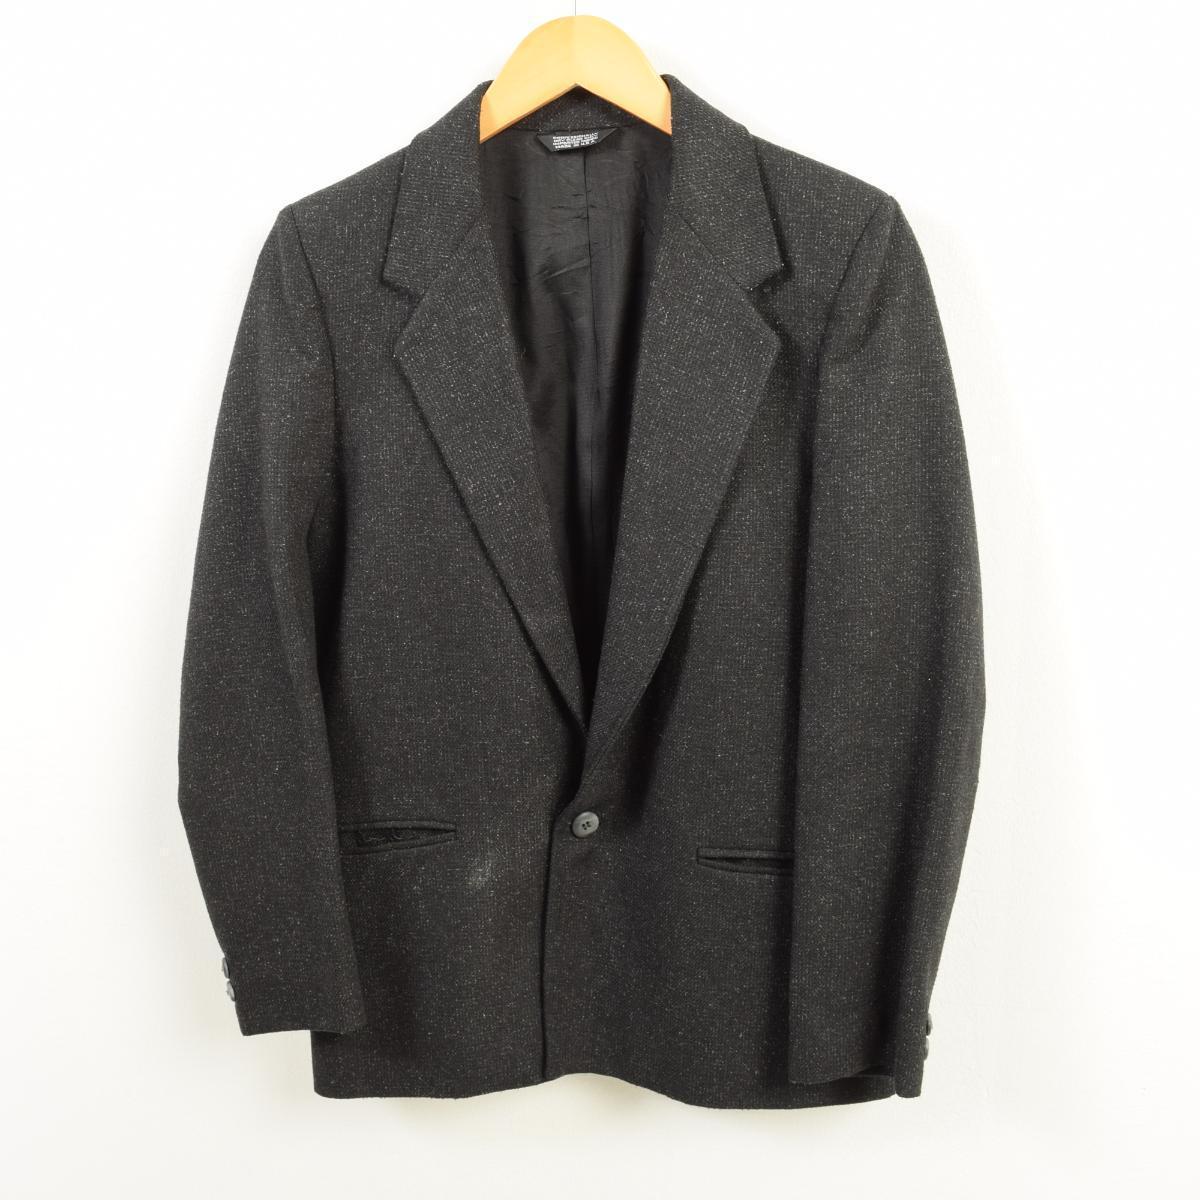 newest ec12e bc505 クリスチャンディオール Christian Dior JEUNE HOMME ウール テーラードジャケット レディースM /waq8786  【181116】